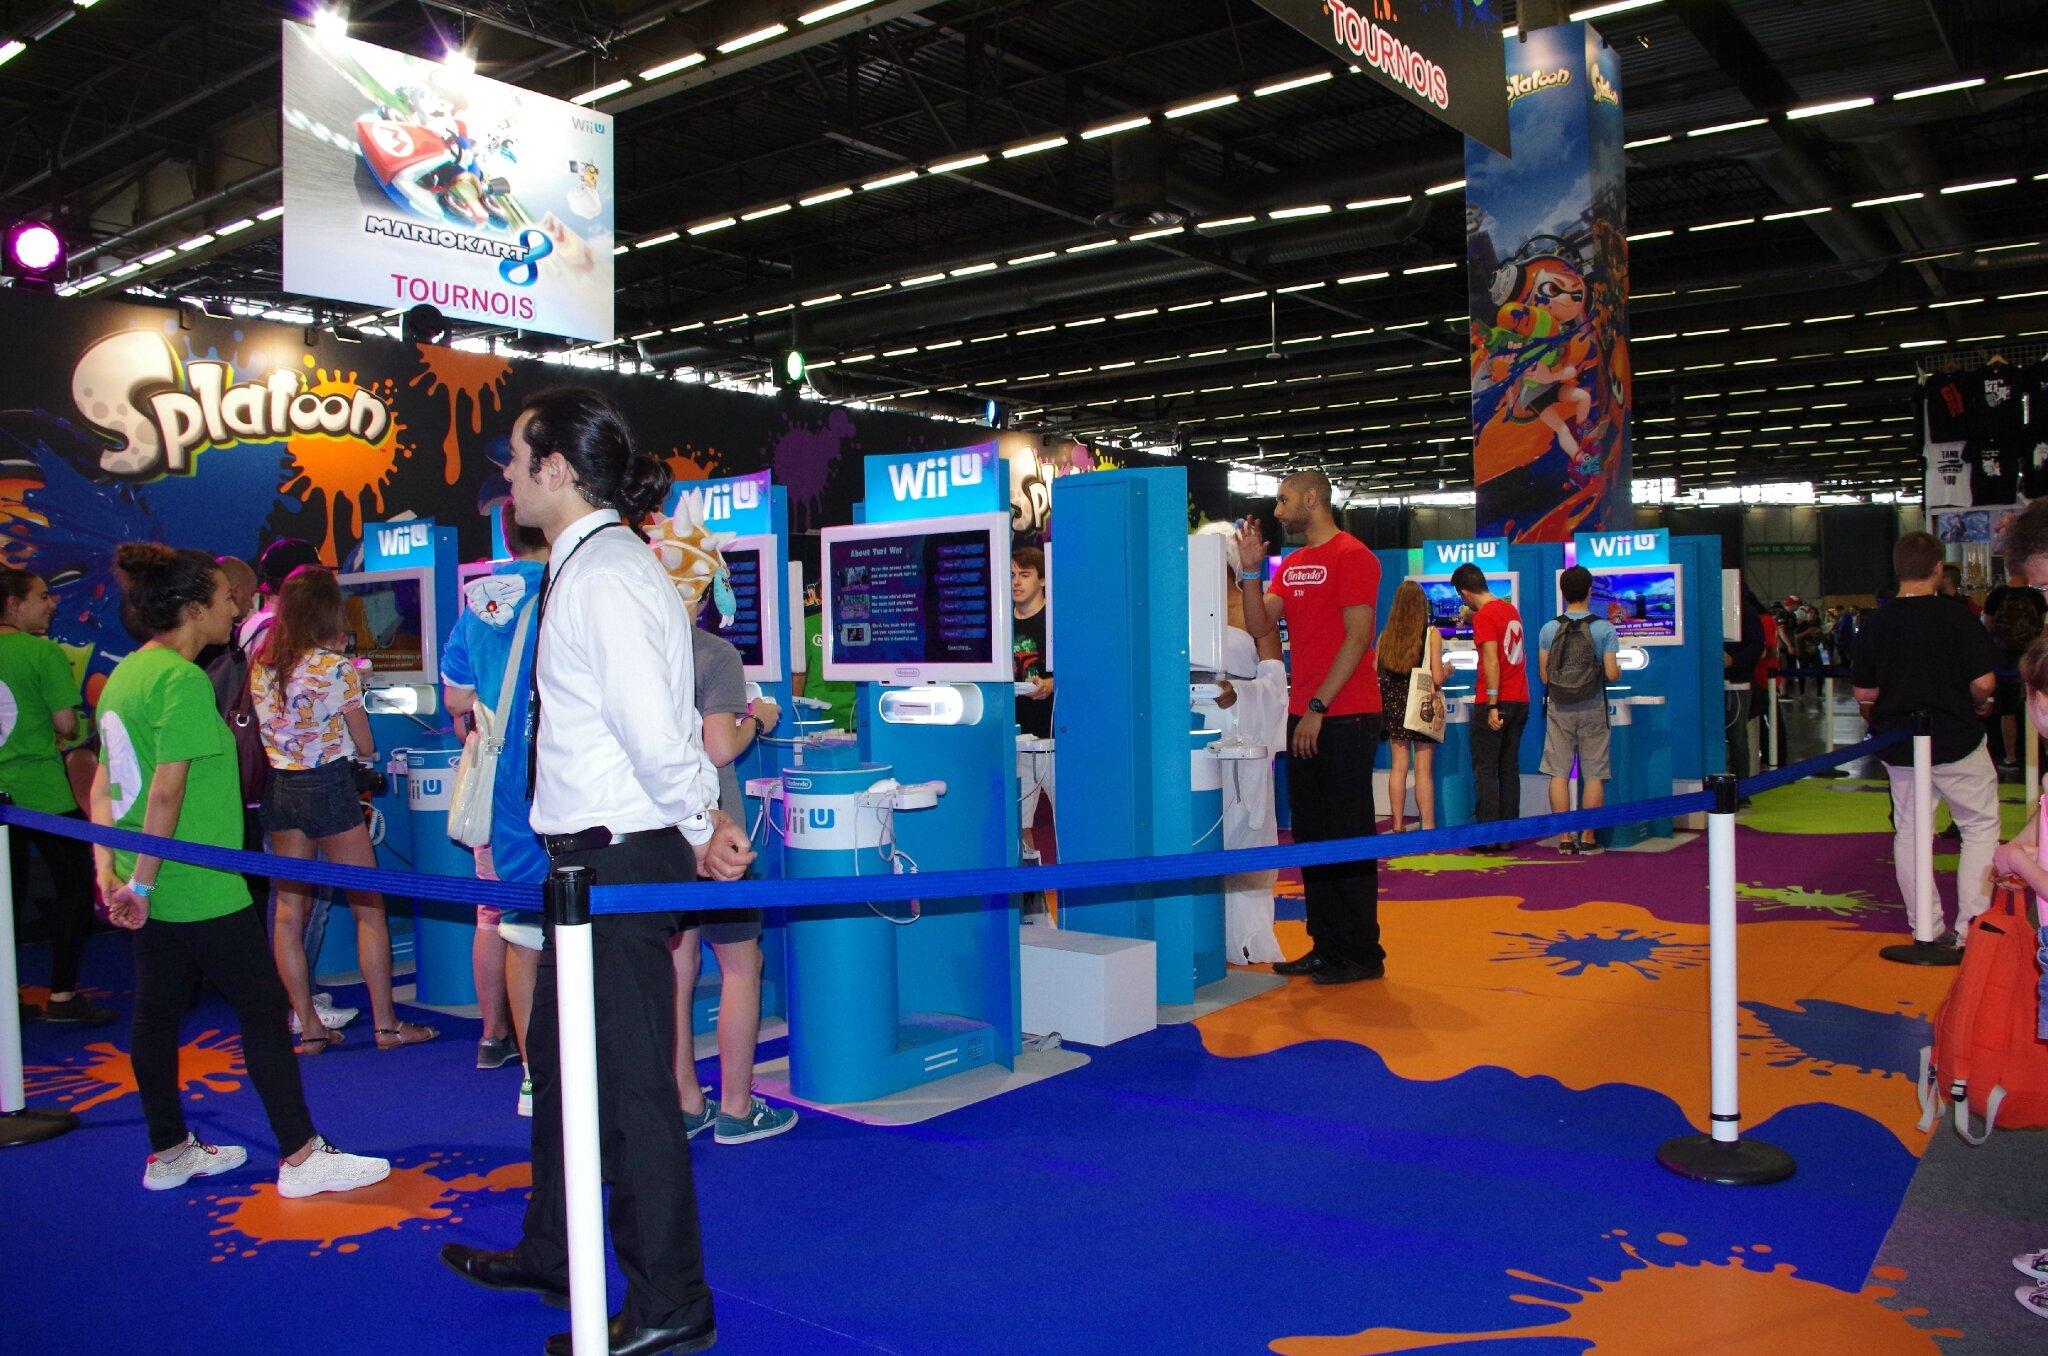 Splatoon sur le stand Nintendo